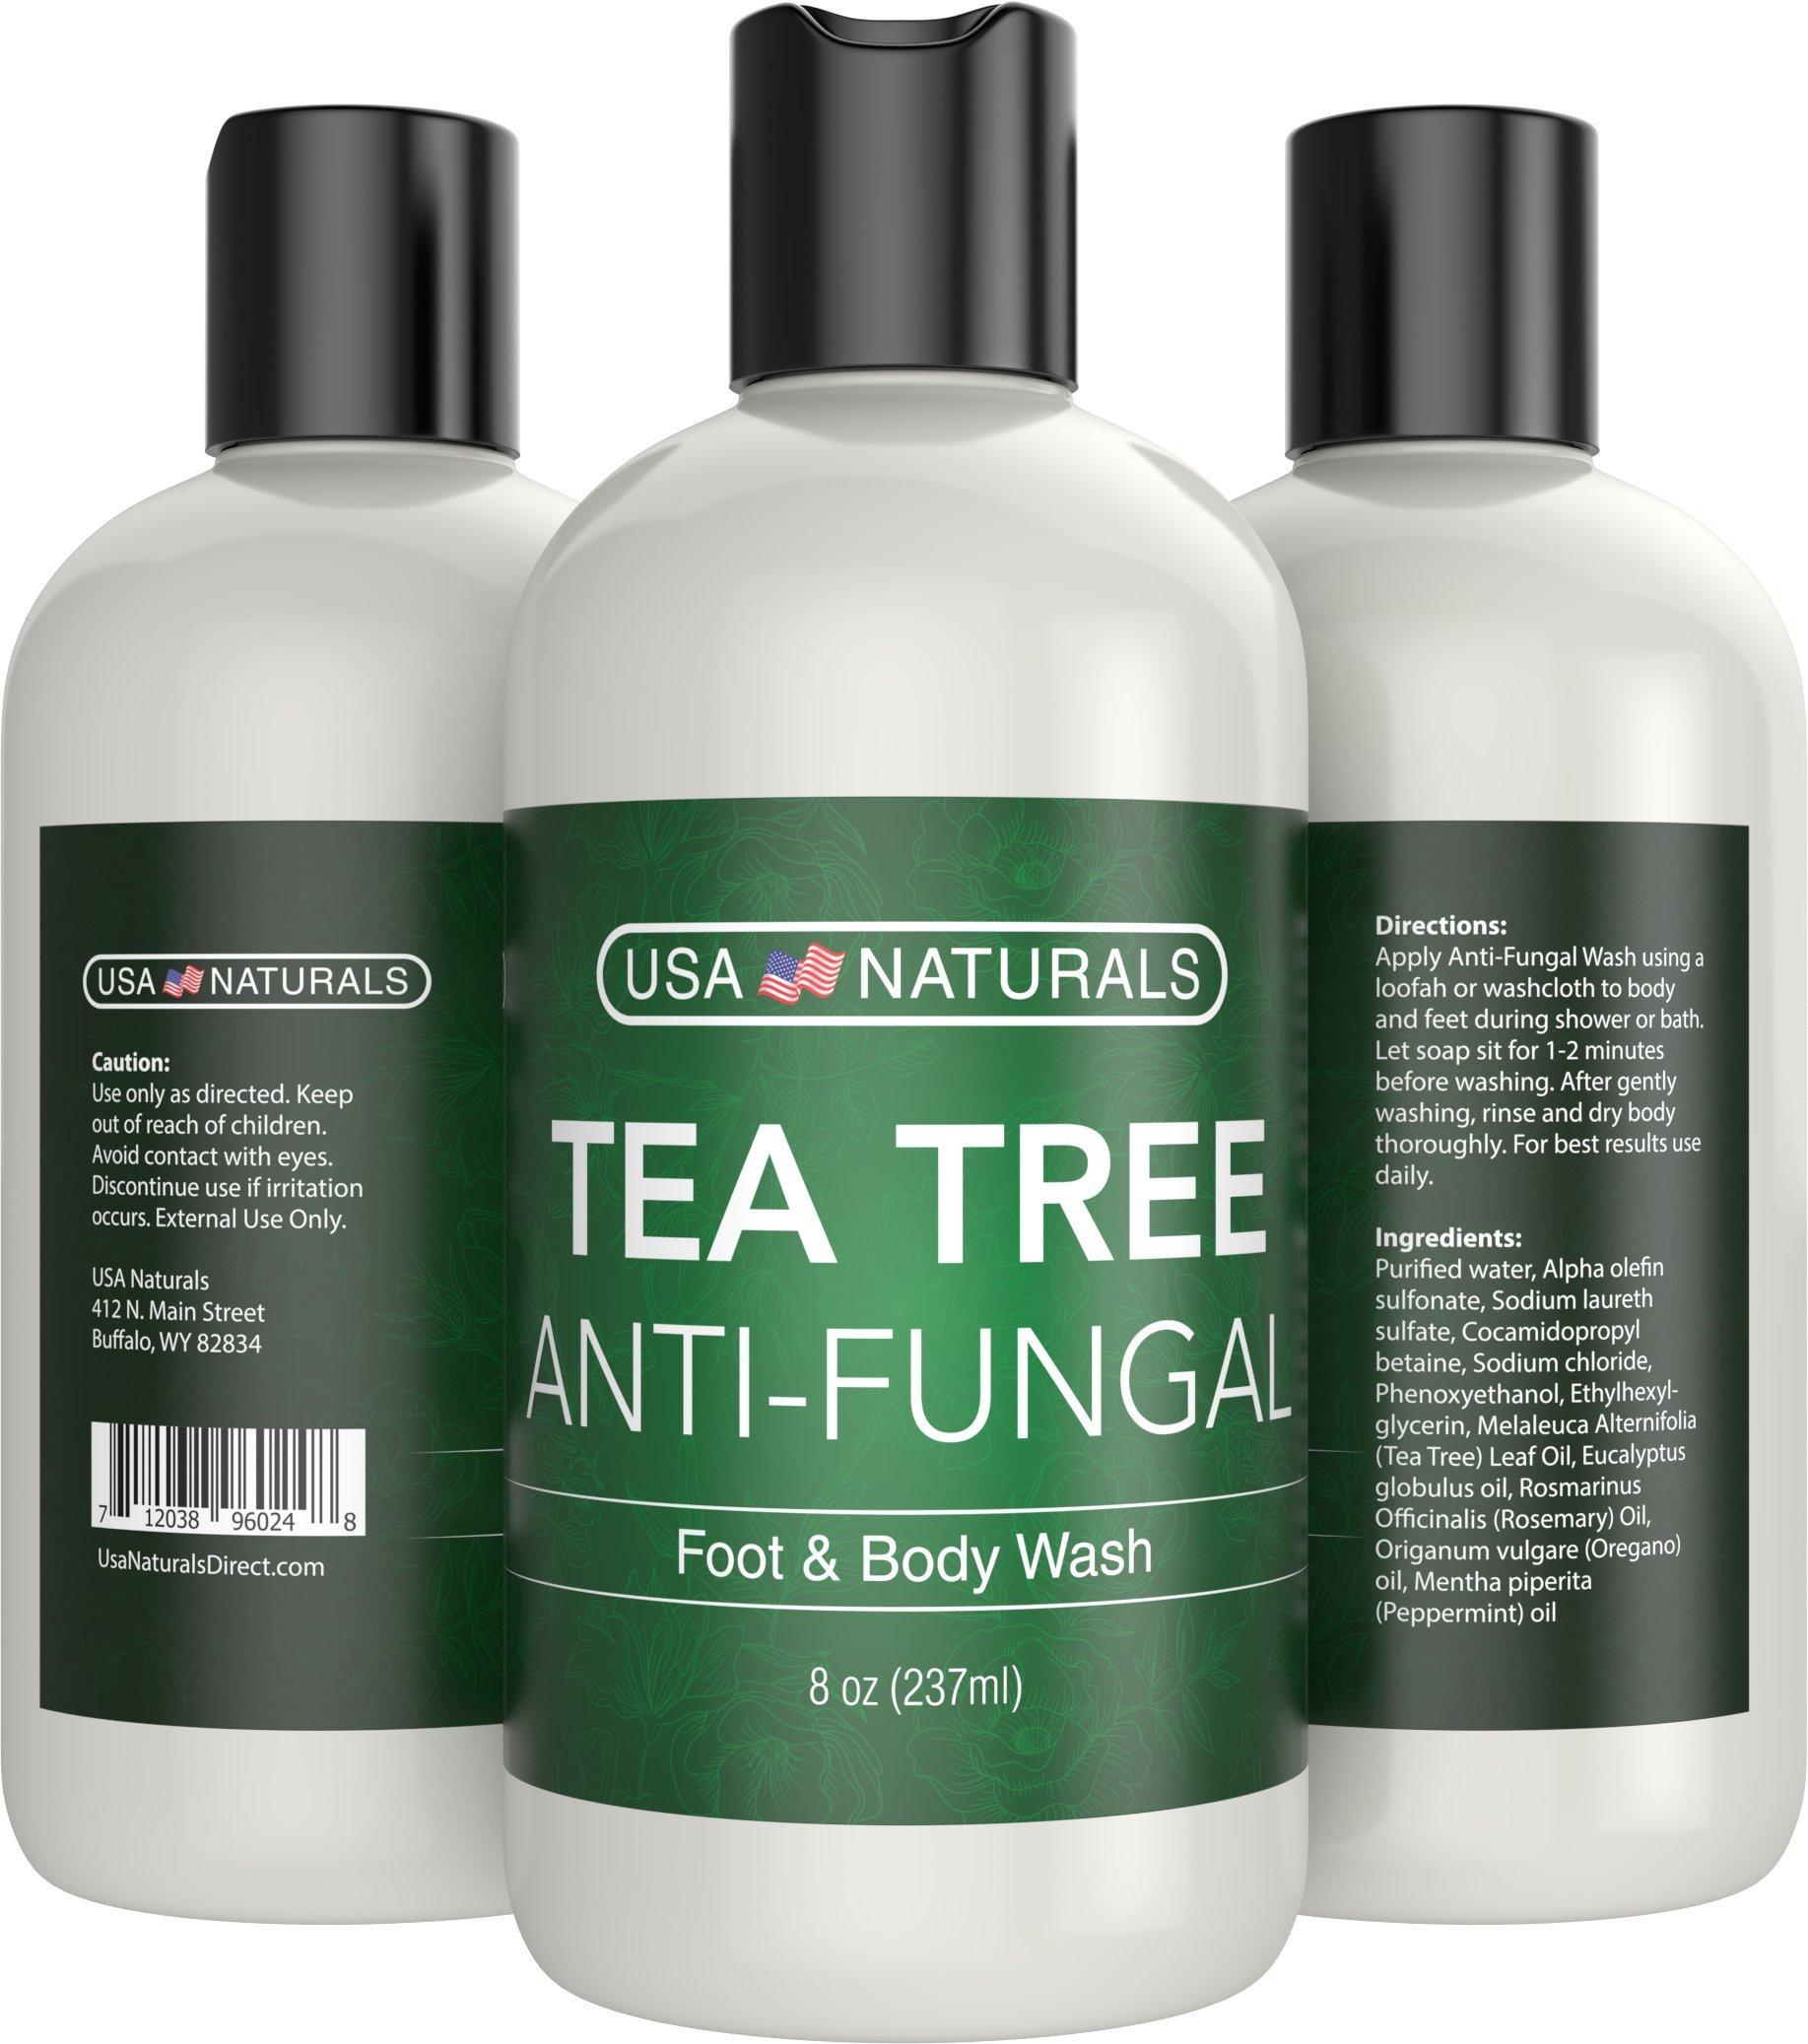 Antifungal Tea Tree Oil Body Wash - Antibacterial Wash Helps Eliminate Body Odor, Athlete's Foot, Acne, Toenail Fungus & Jock Itch Soothes Body Itch, Eczema & Skin Irritations-Premium Anti-fungal Soap